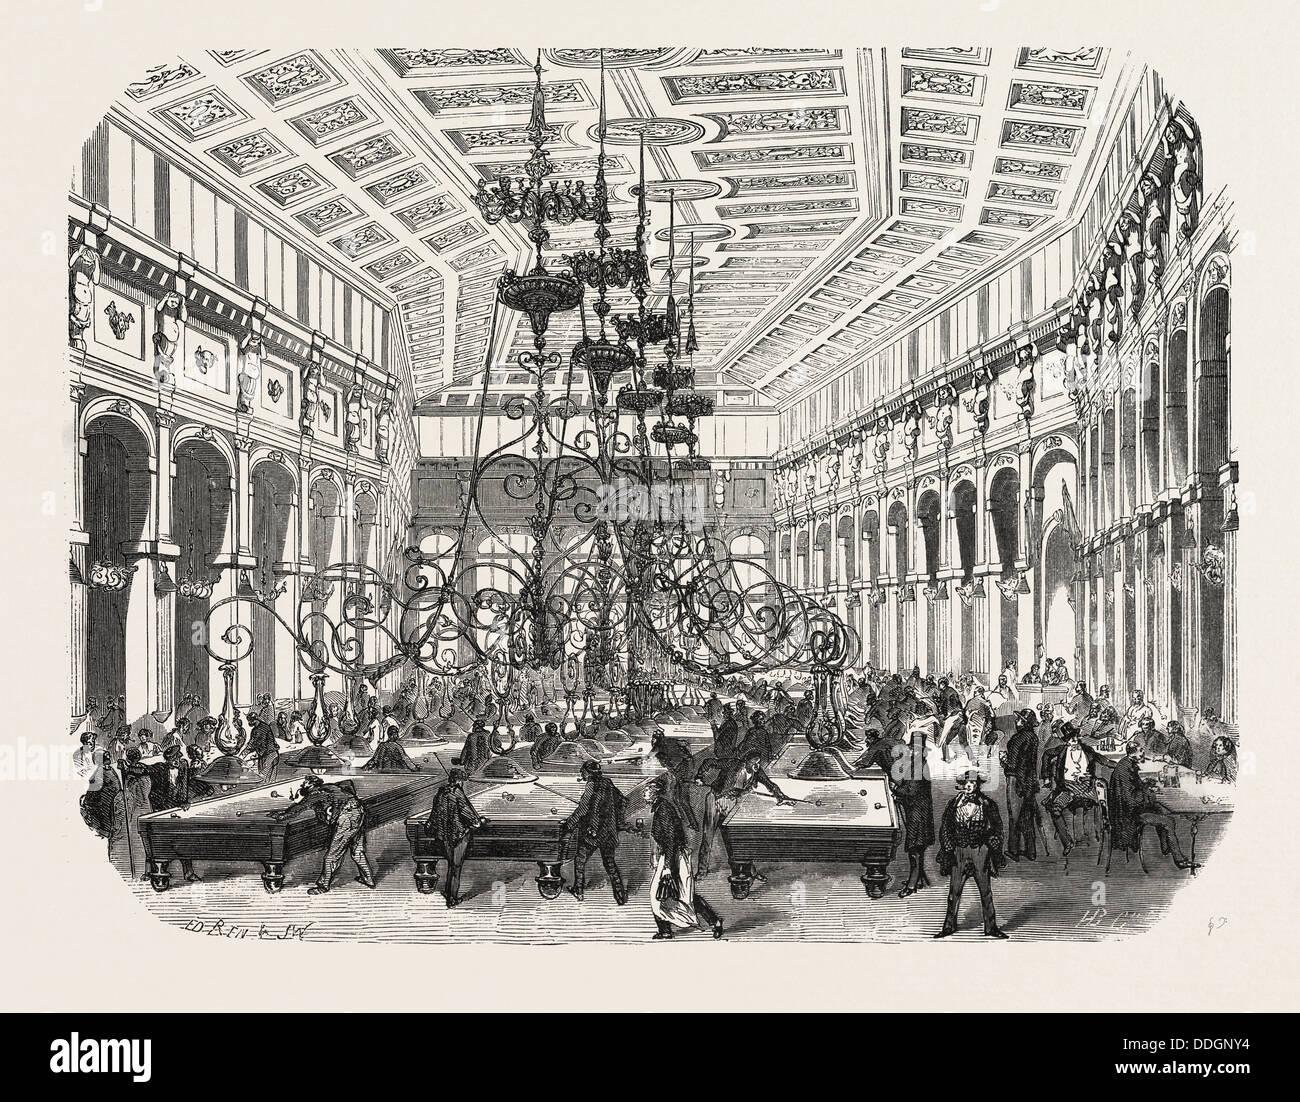 The Grand Cafe Parisien on the Boulevard Saint-Martin, Paris, France. engraving 1855 - Stock Image